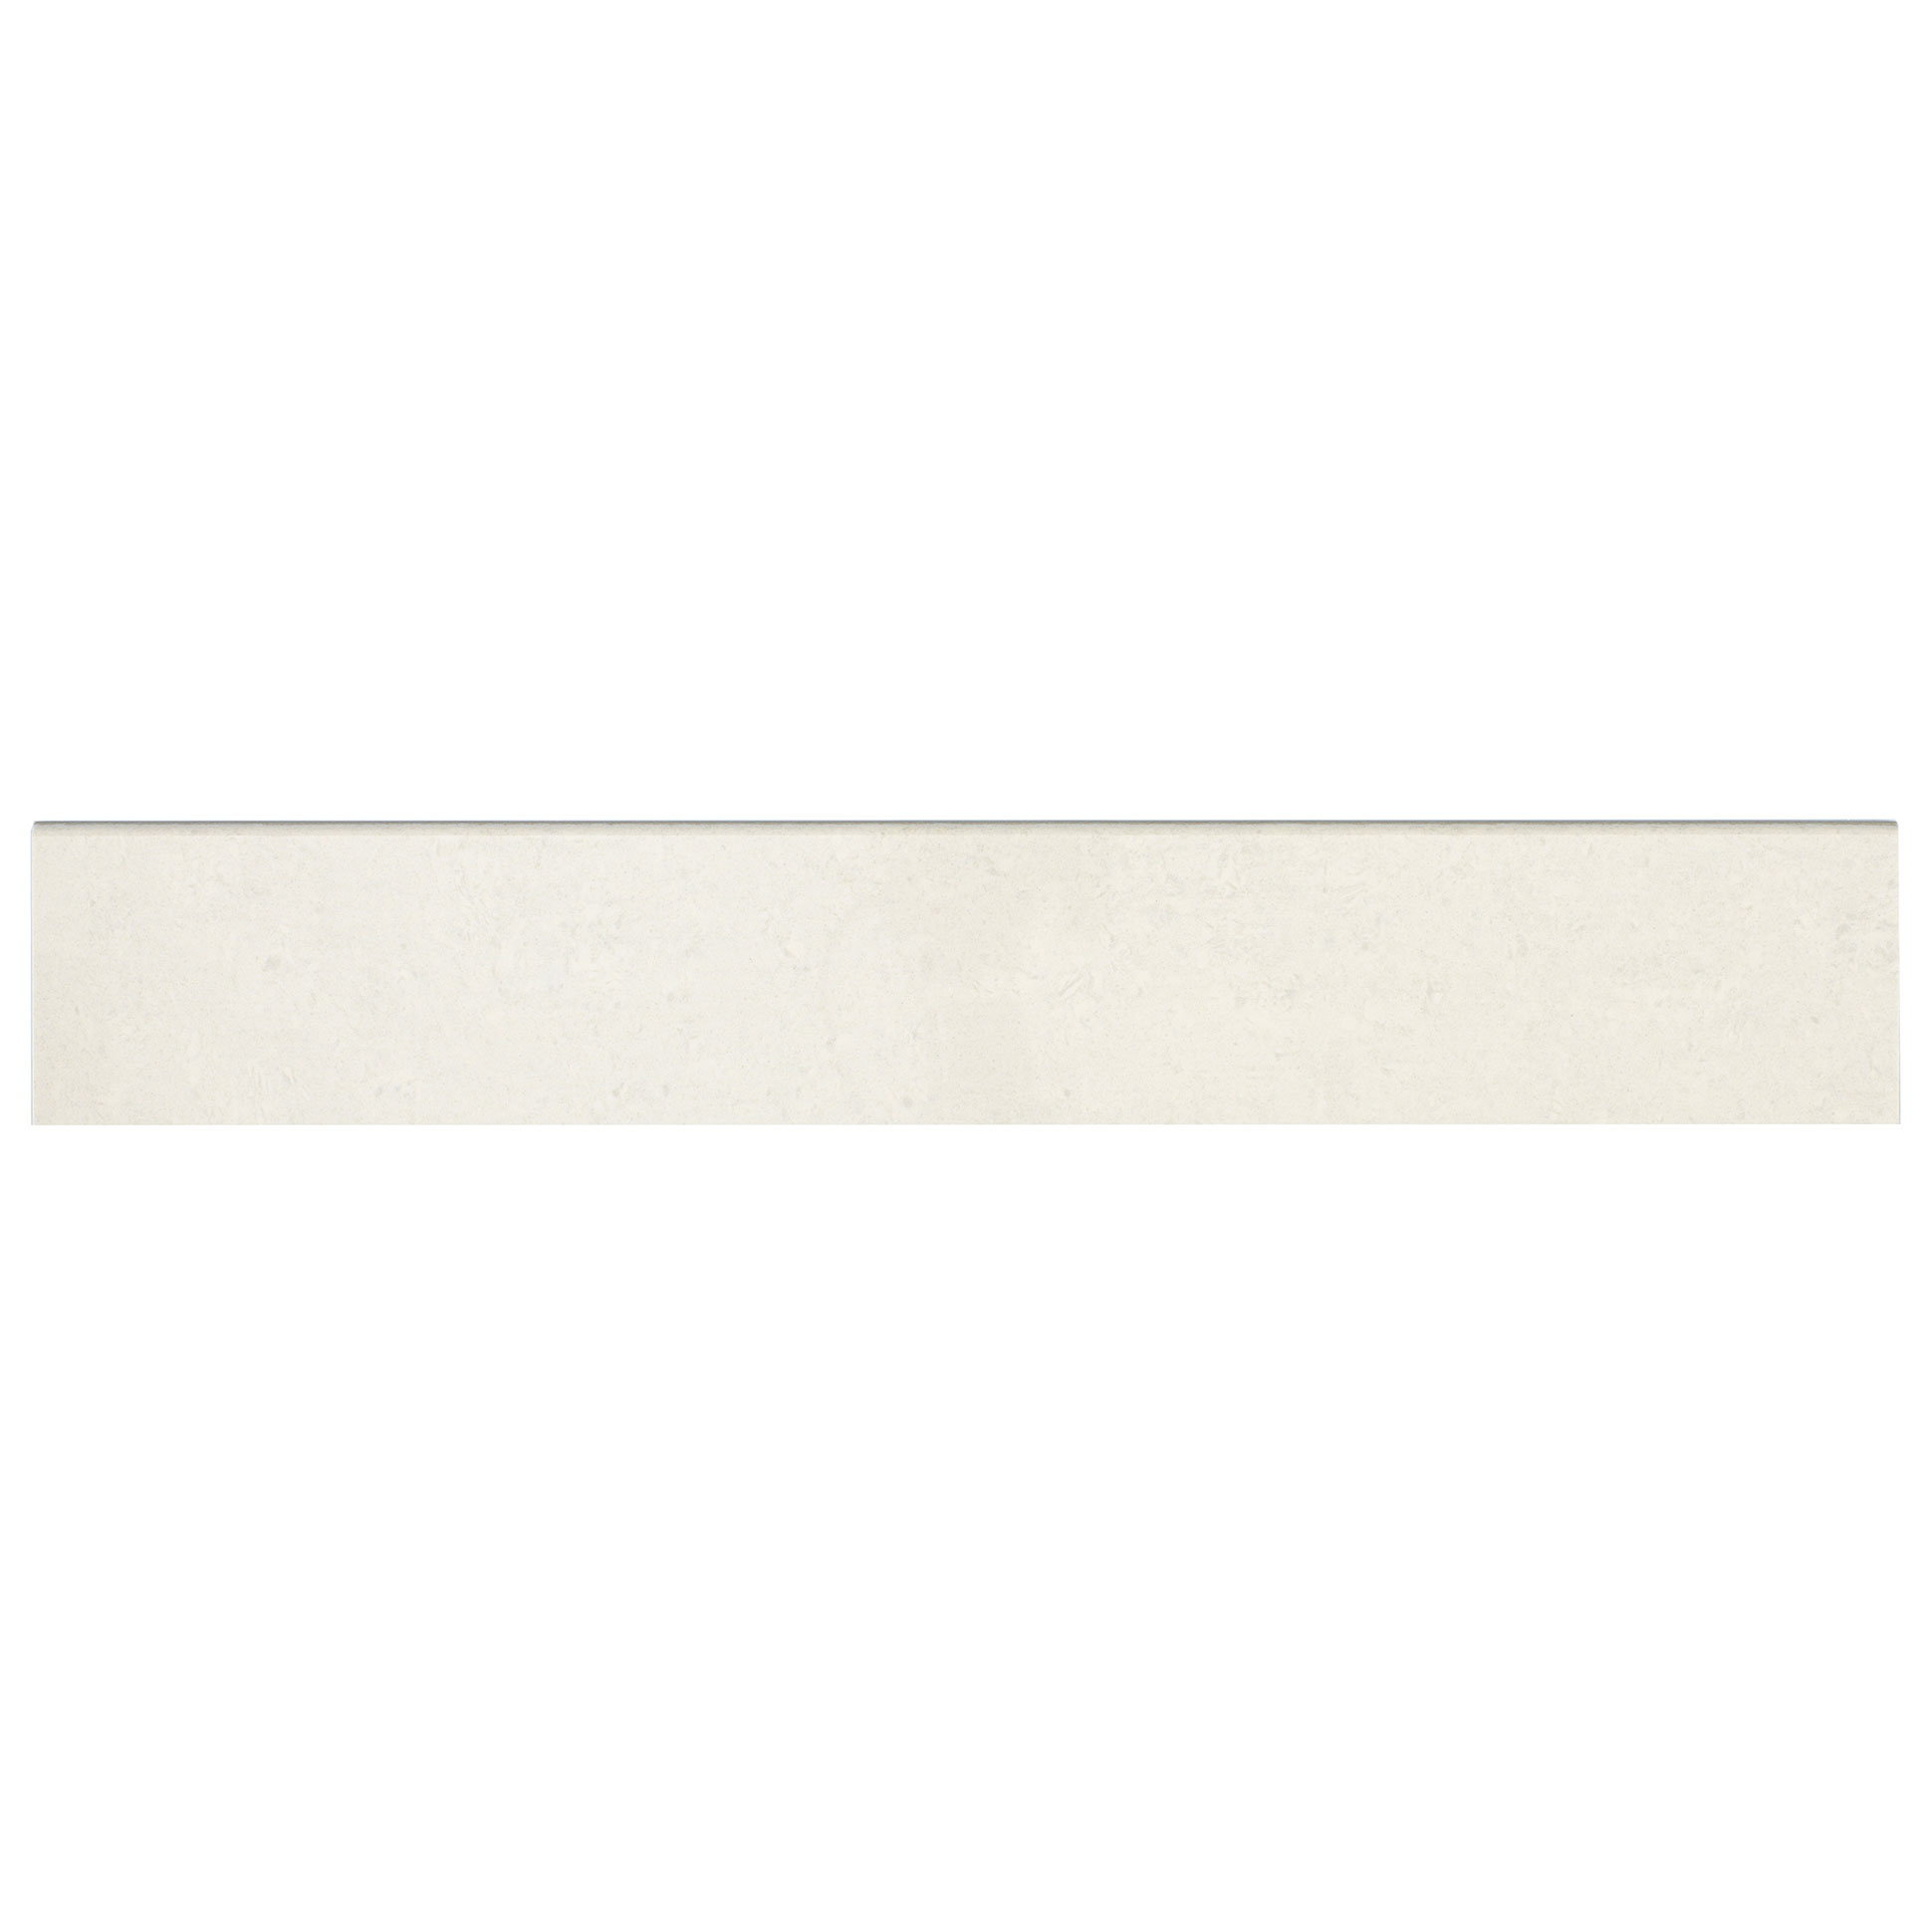 Klinker Arredo Fojs Collection Snow White Glossy 9,8×60 cm Sockel